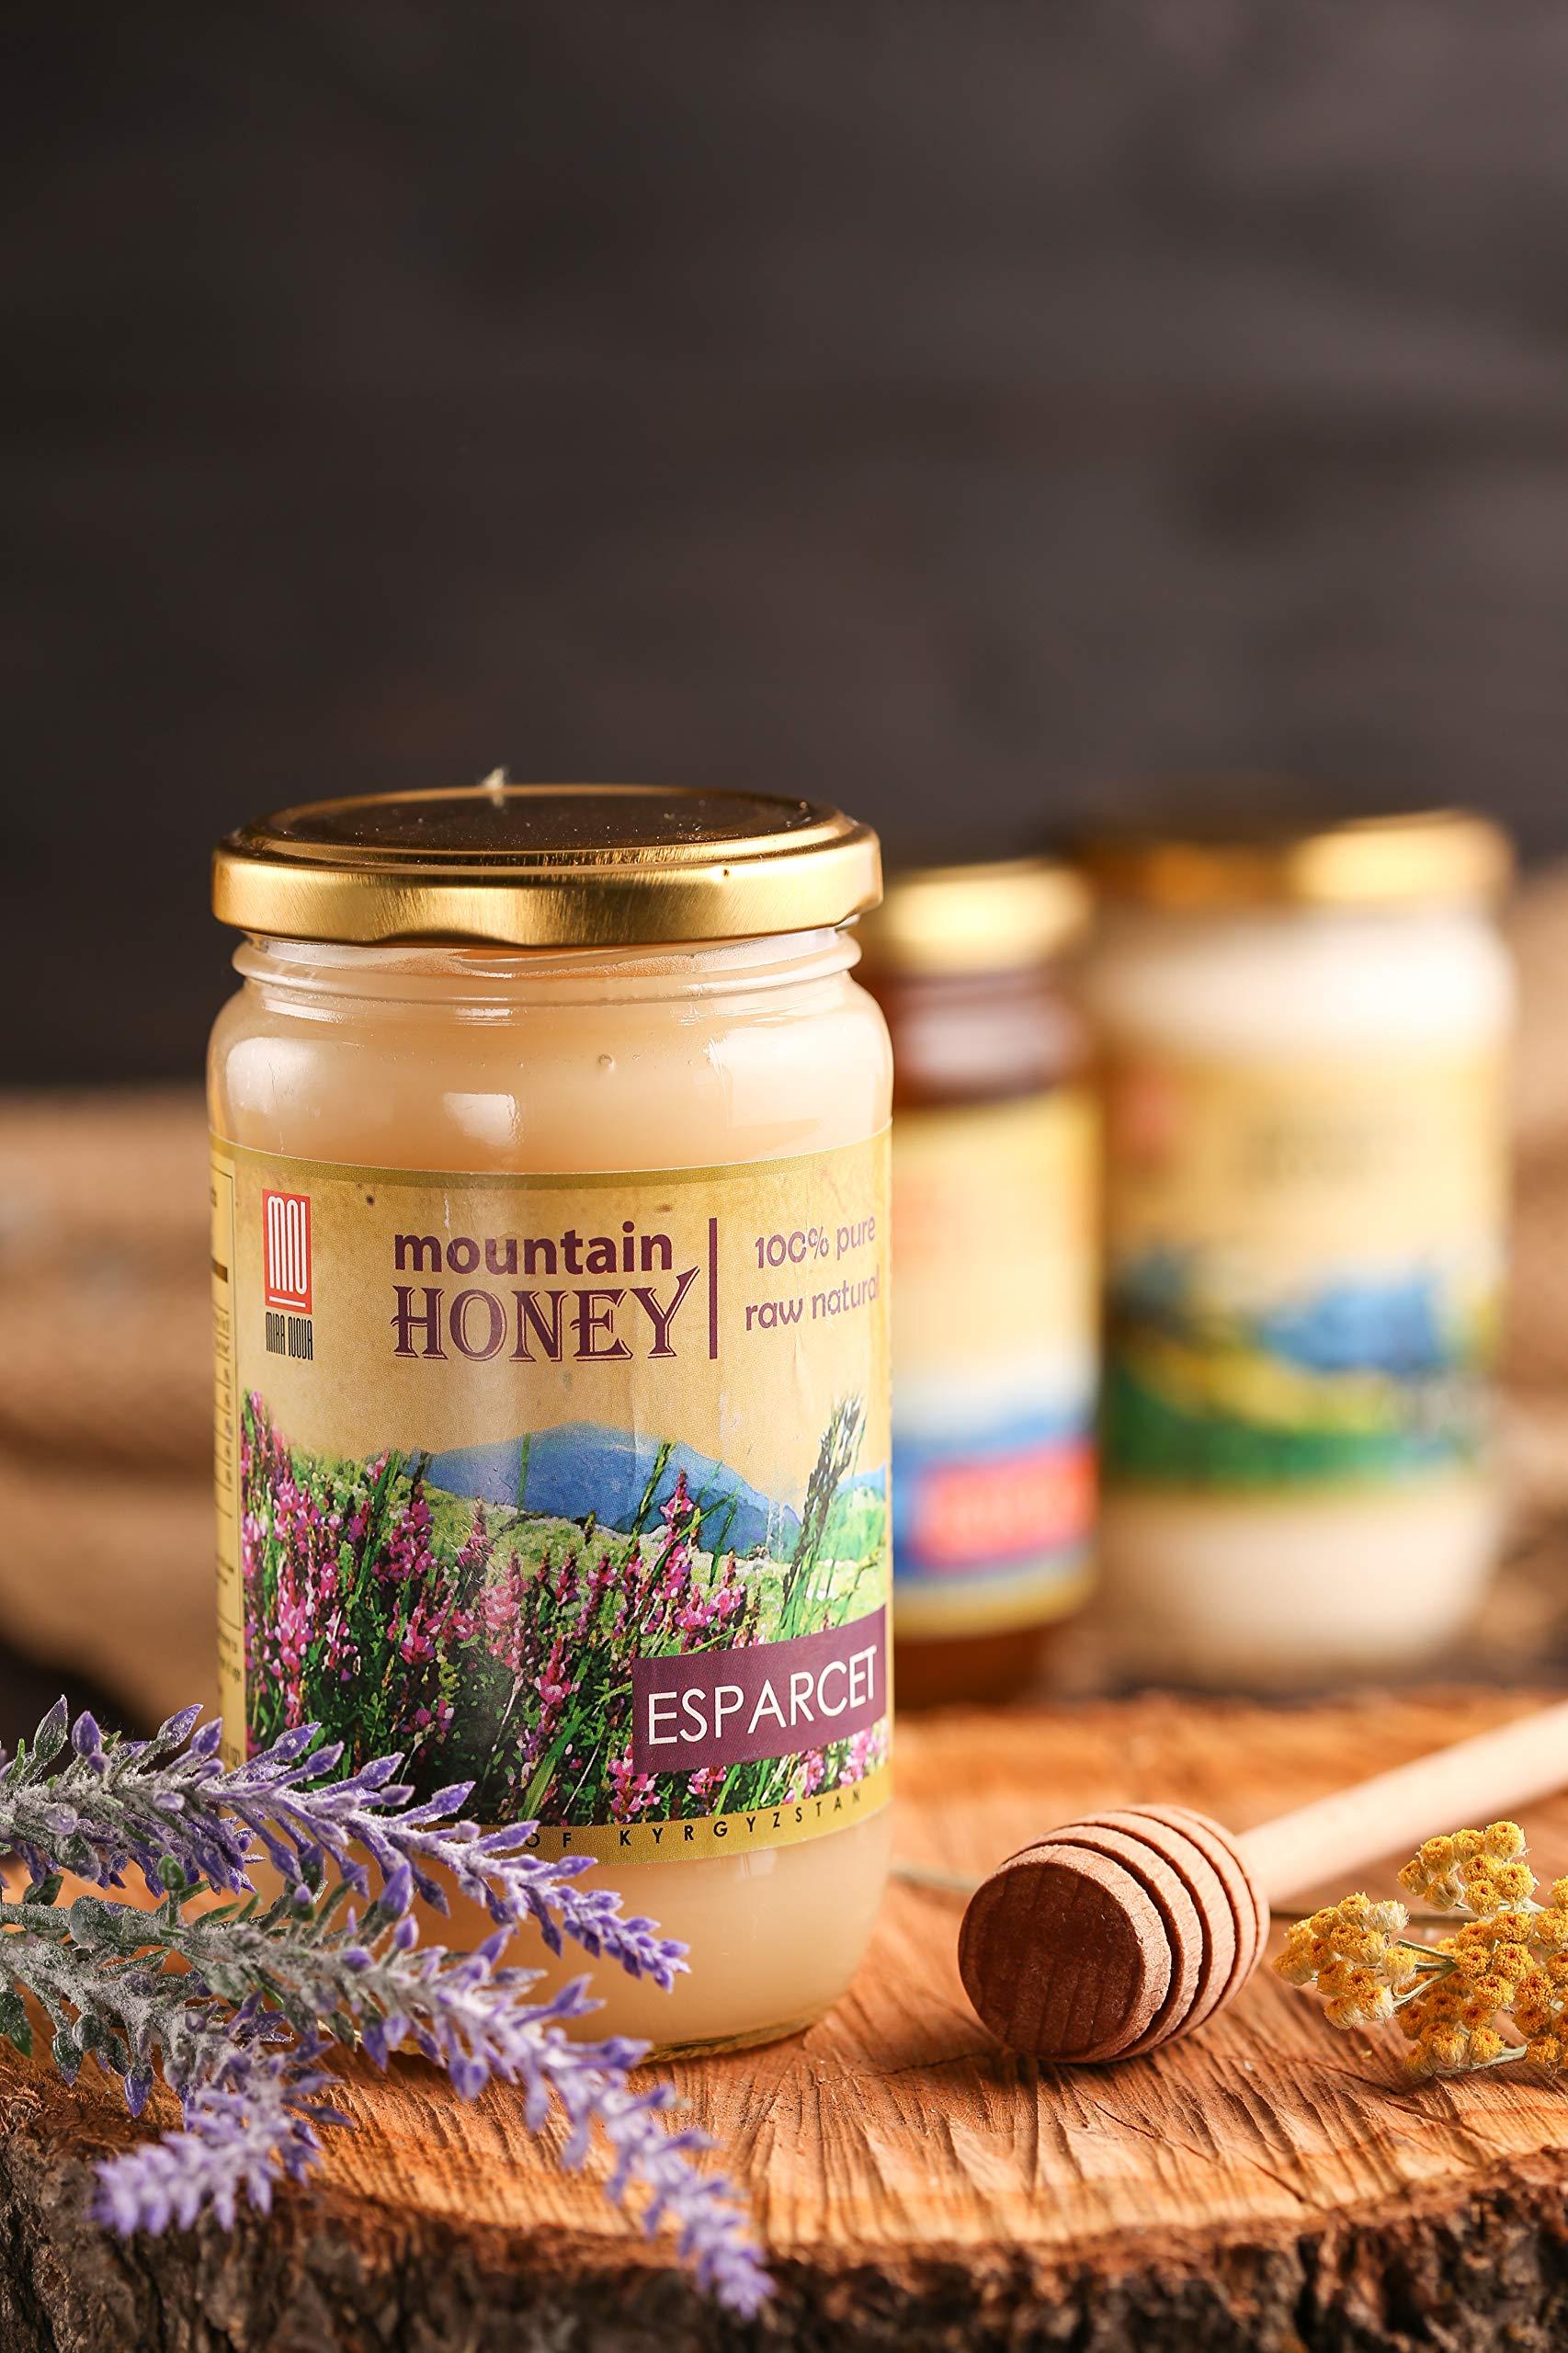 Kyrgyz Honey; Esparcet Raw Natural Sainfoin Mountain Honey; 17.63 Ounce Glass Jar by Mira Nova (Image #2)